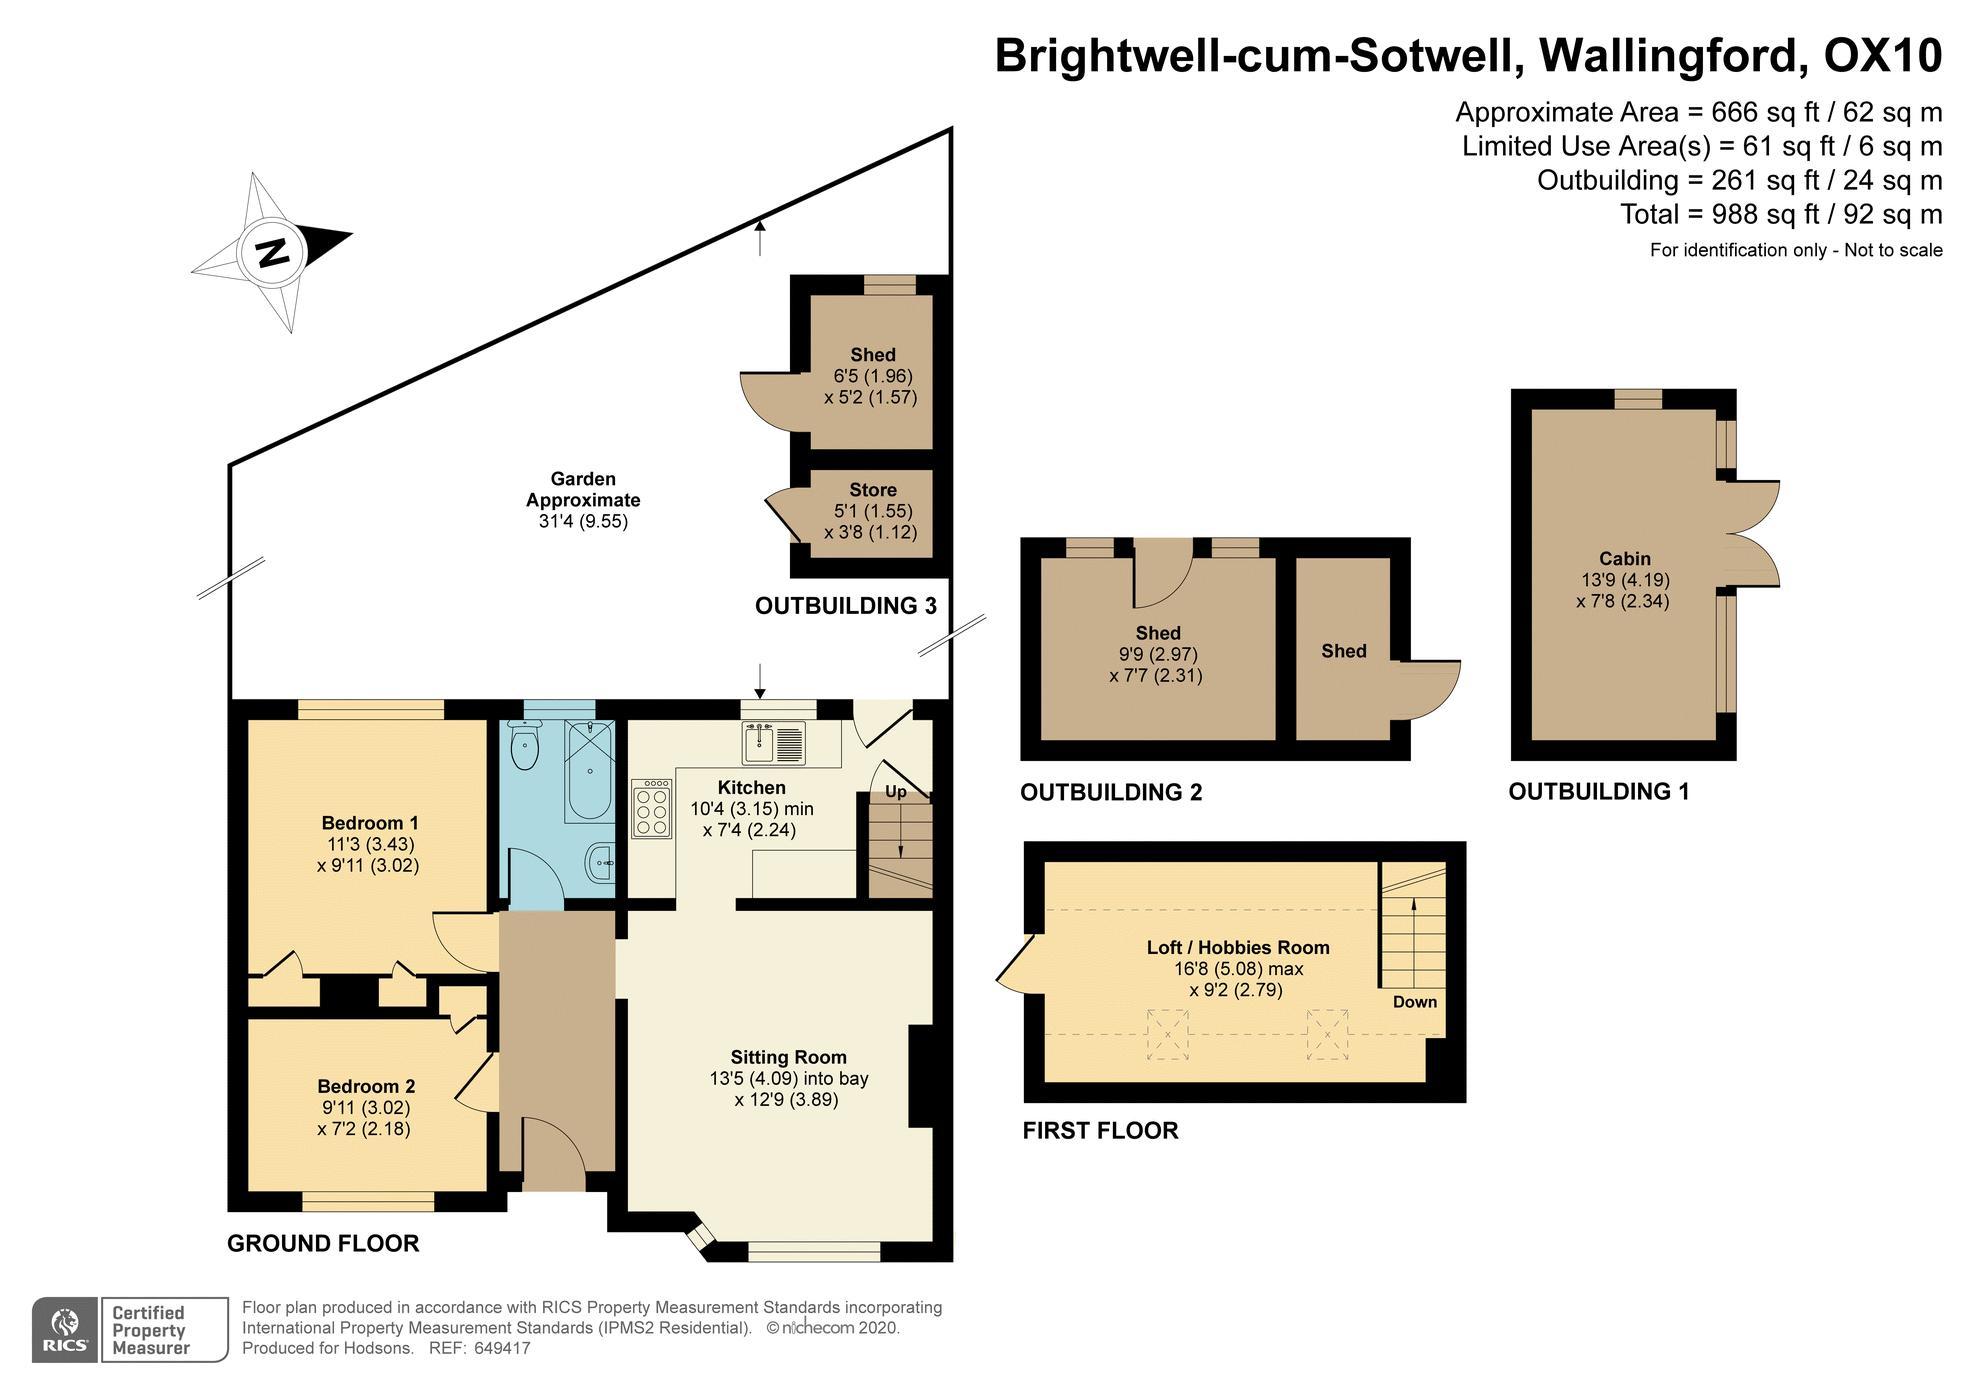 Greenmere Brightwell-cum-Sotwell